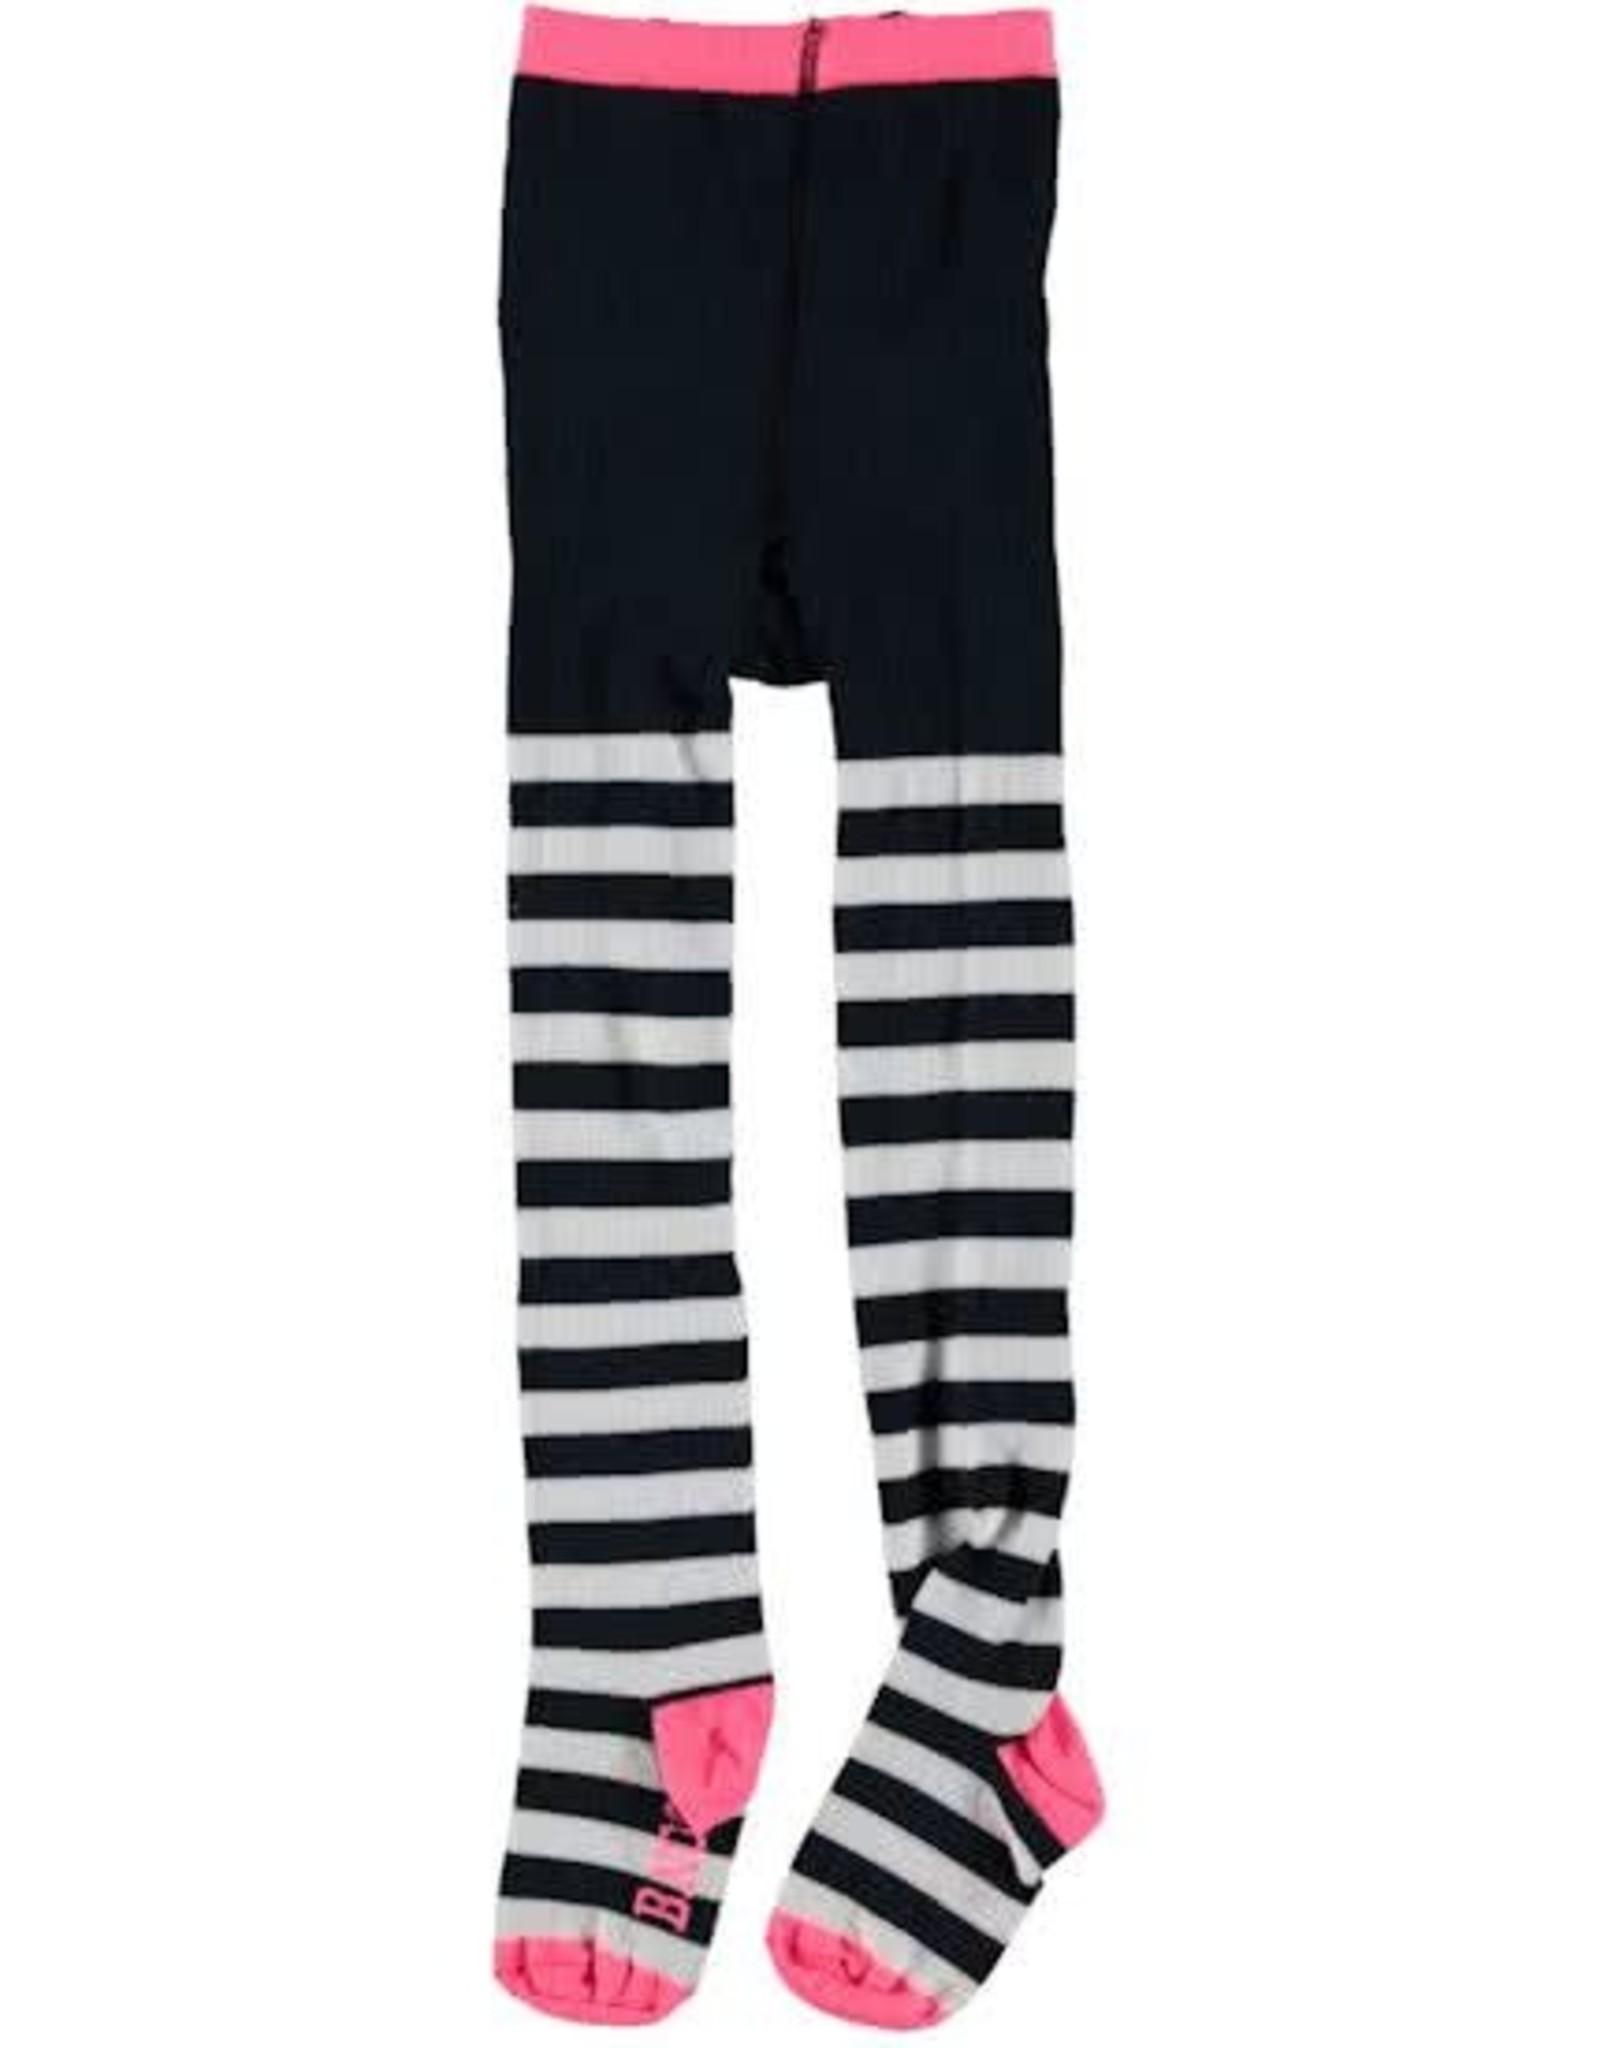 B. Nosy Girls maillot AO stripe marsh mallow + midnight